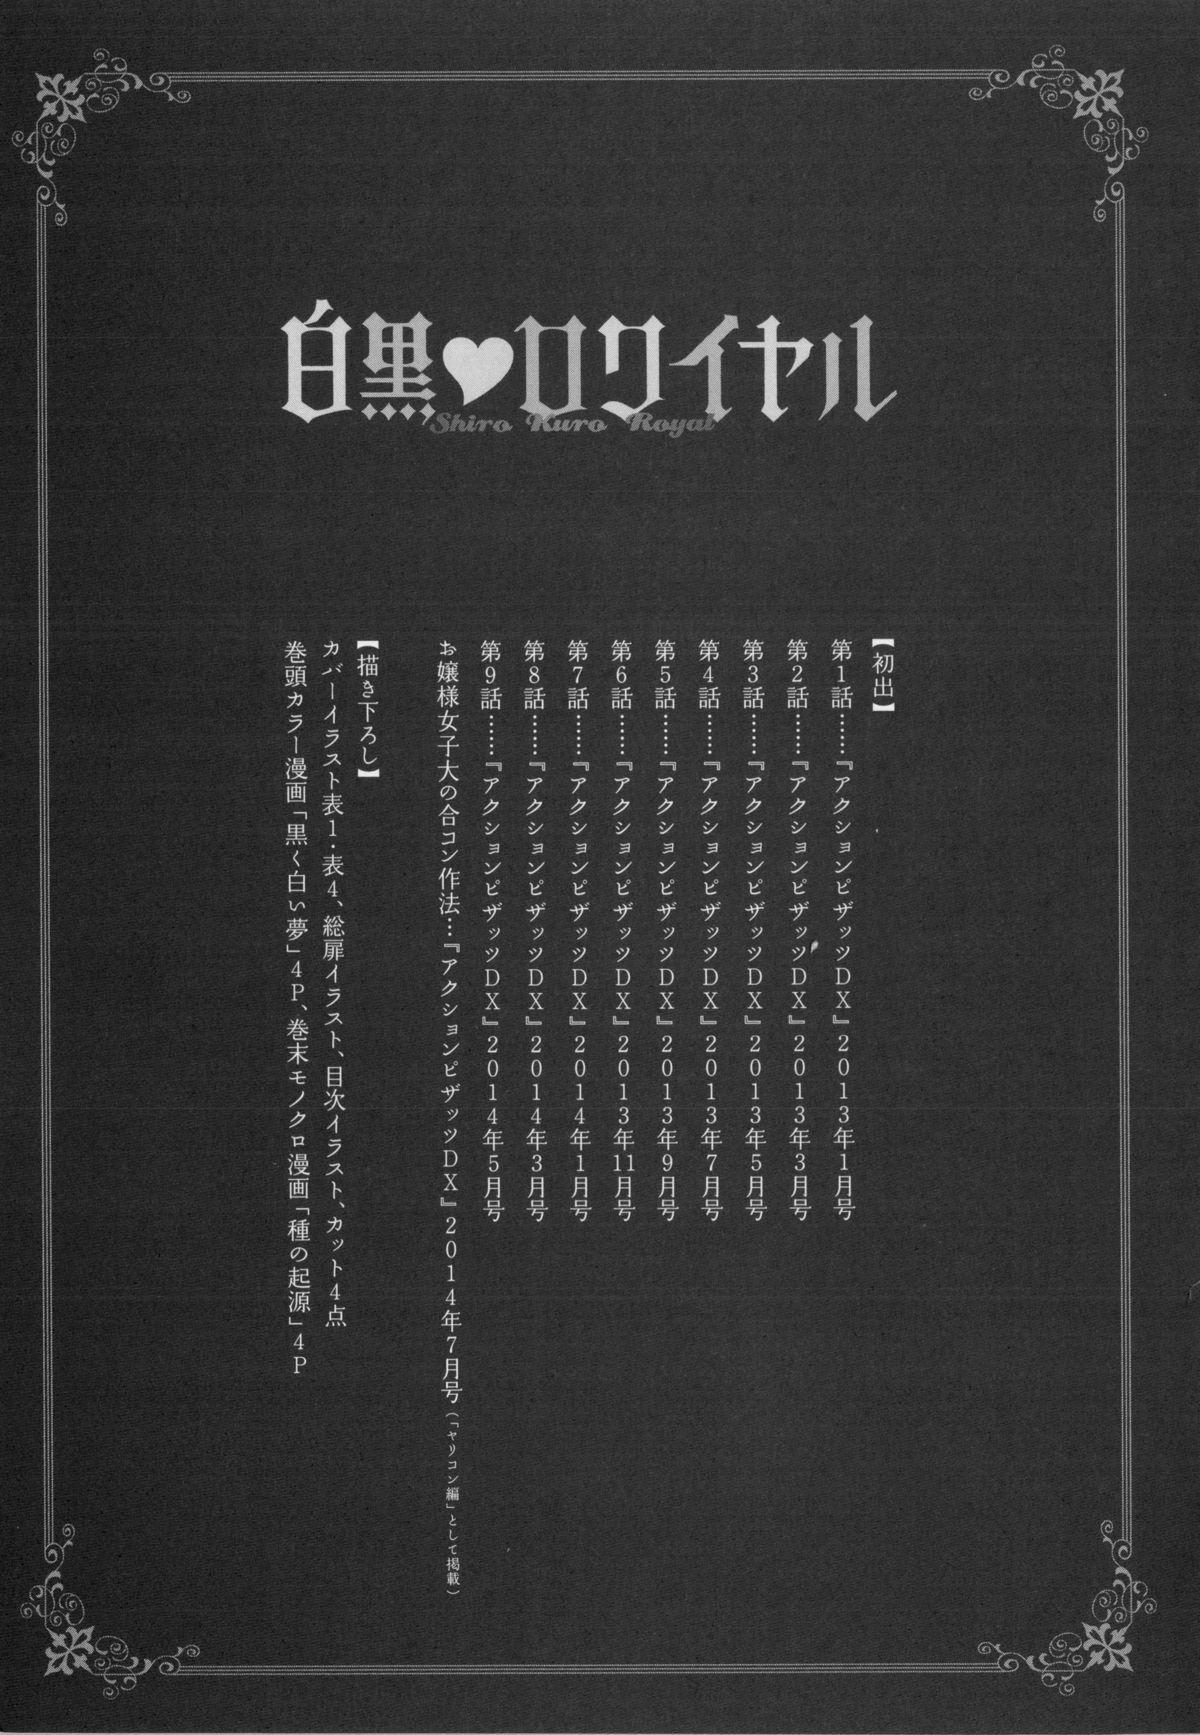 Shiro Kuro Royal Ch. 0-9 & Extra Chapter 195